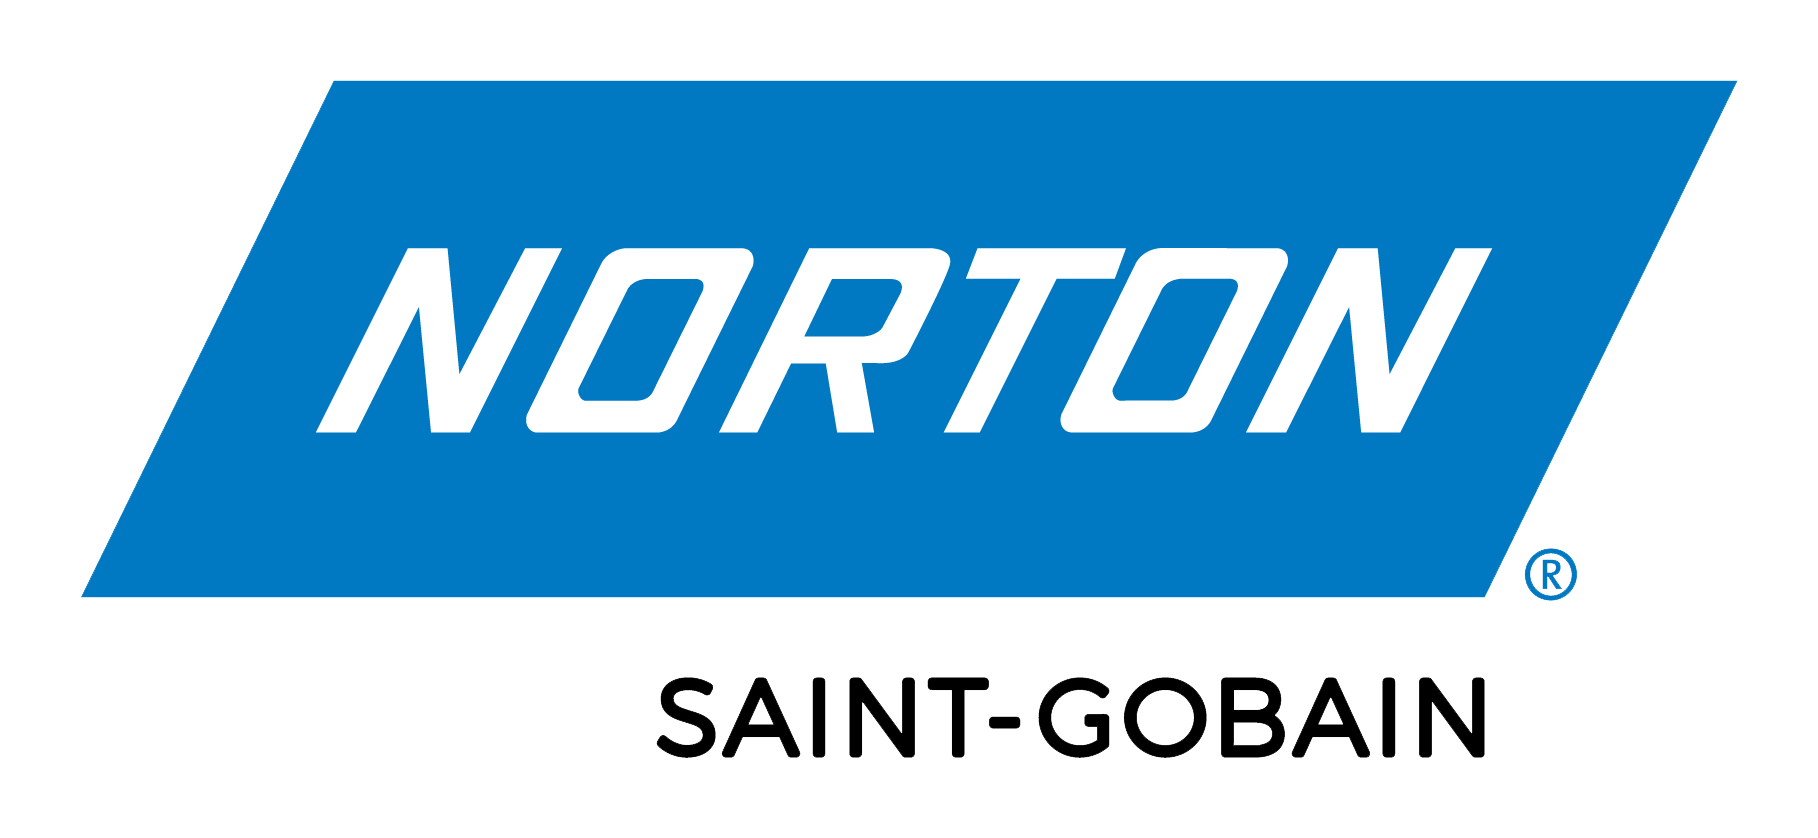 SG_Norton_logo_rgb_16